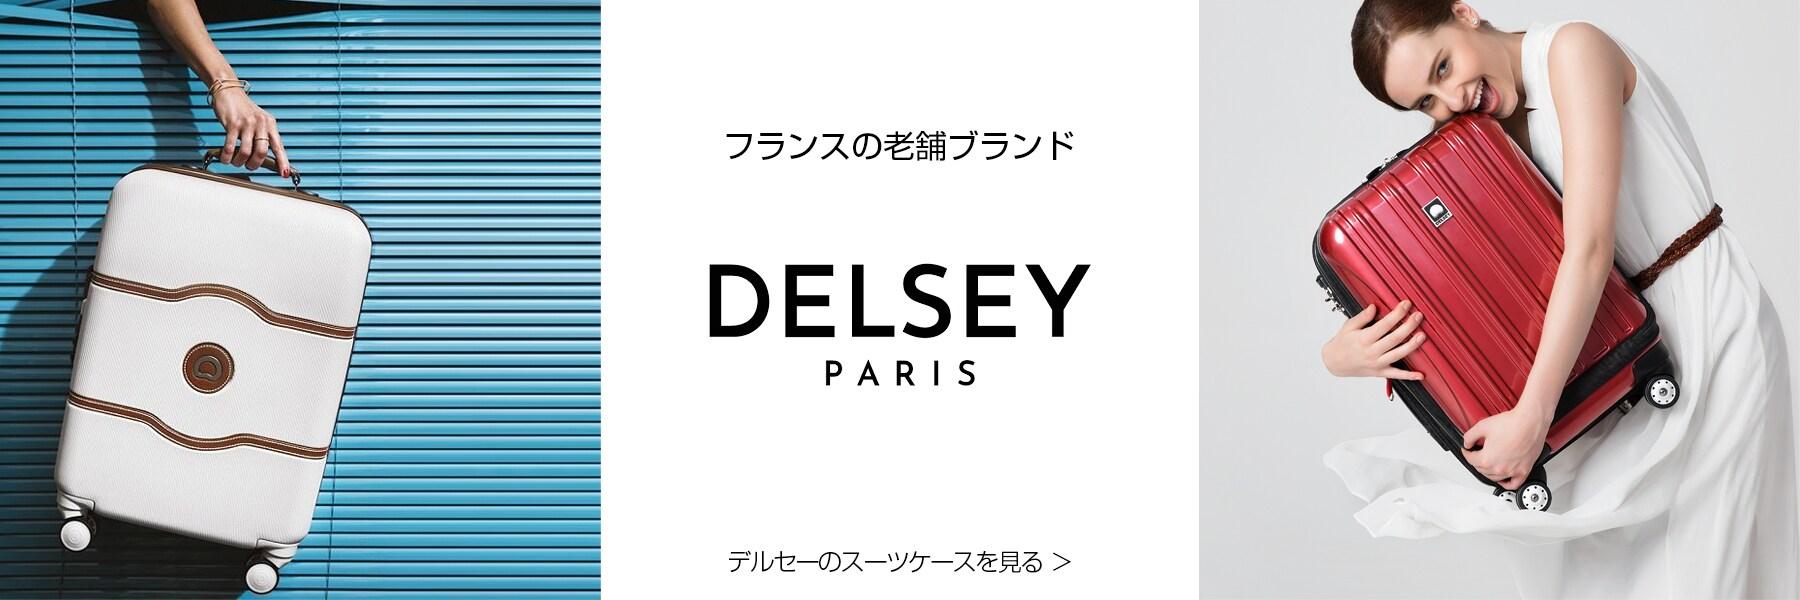 DELSEY デルセー